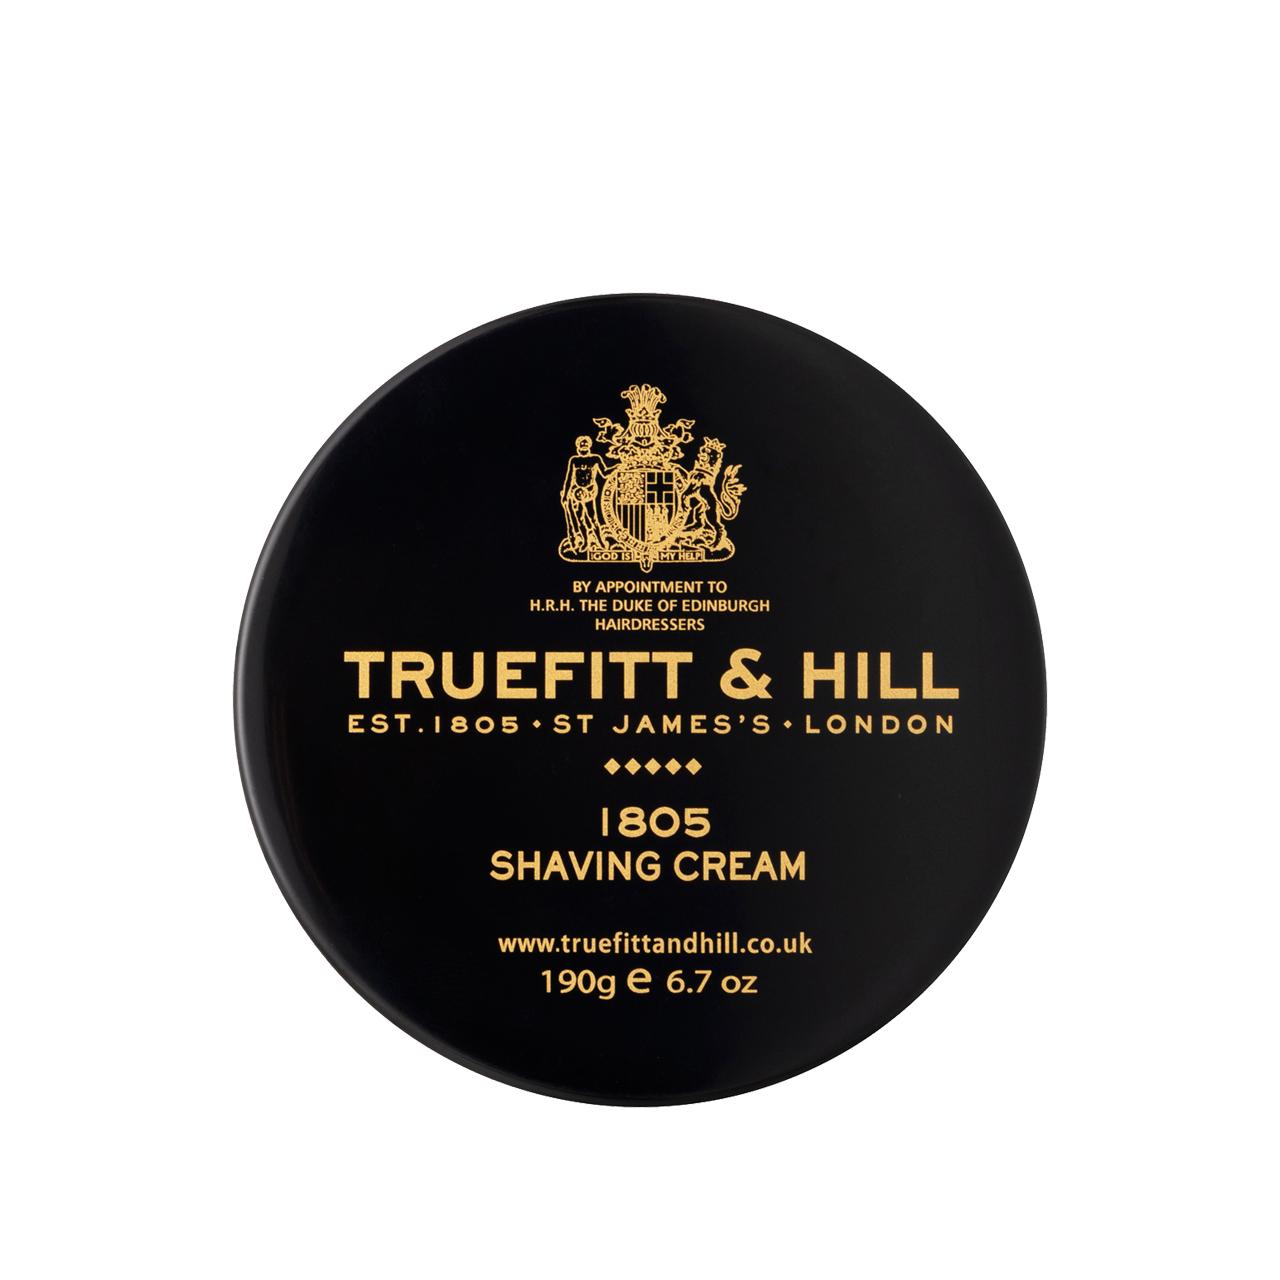 1805 - Shaving Cream Bowl